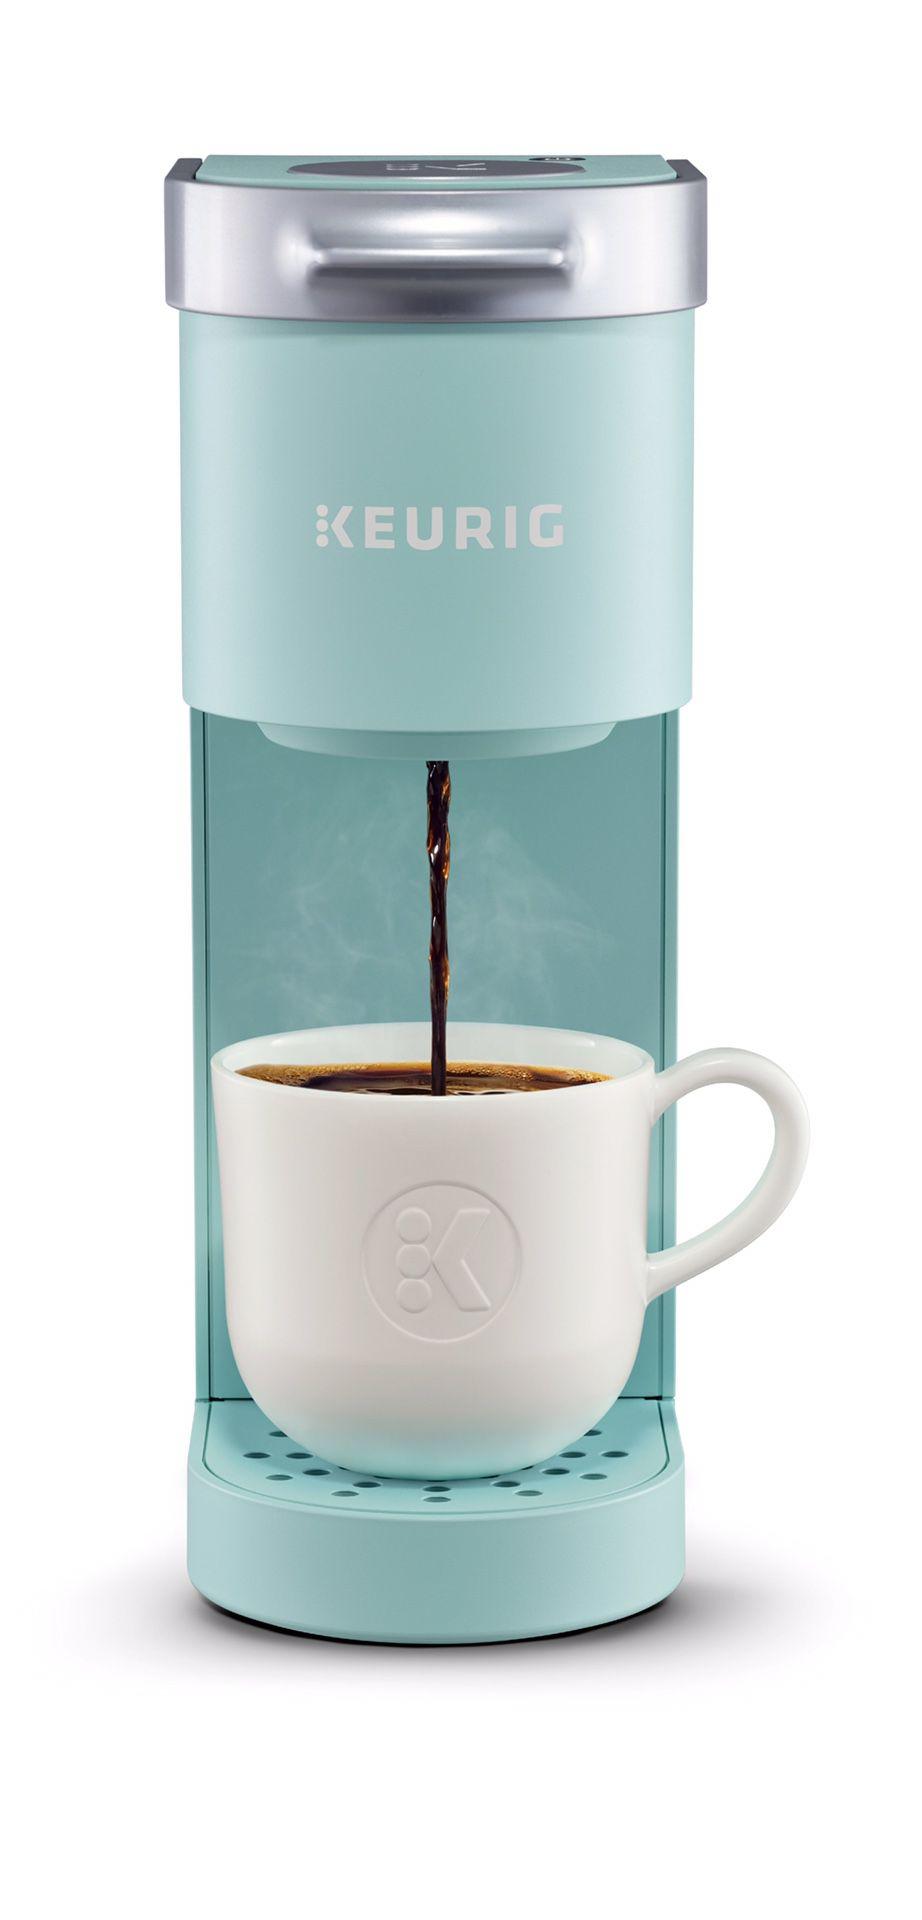 🔥Single Serve K-Cup Pod Coffee Maker, 6 to 12 oz. Brew Sizes 🔥